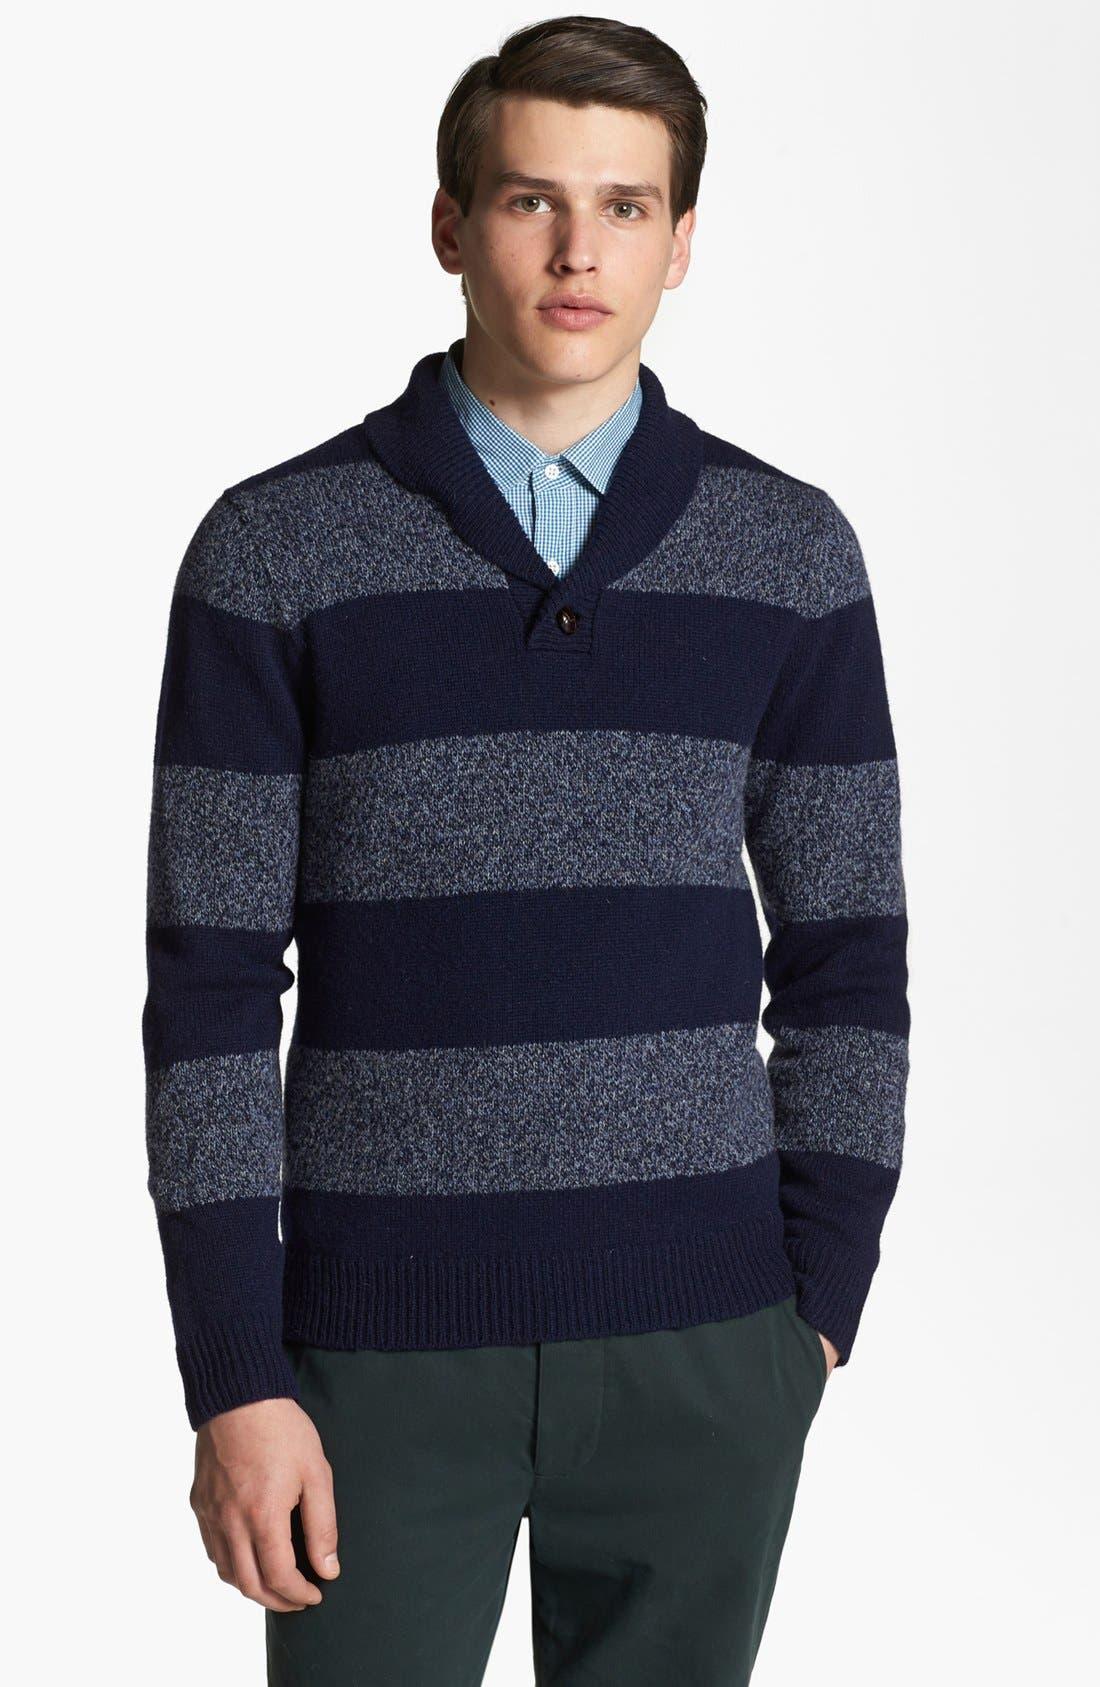 SHIPLEY & HALMOS, 'Earnest' Stripe Wool Shawl Collar Sweater, Main thumbnail 1, color, 415